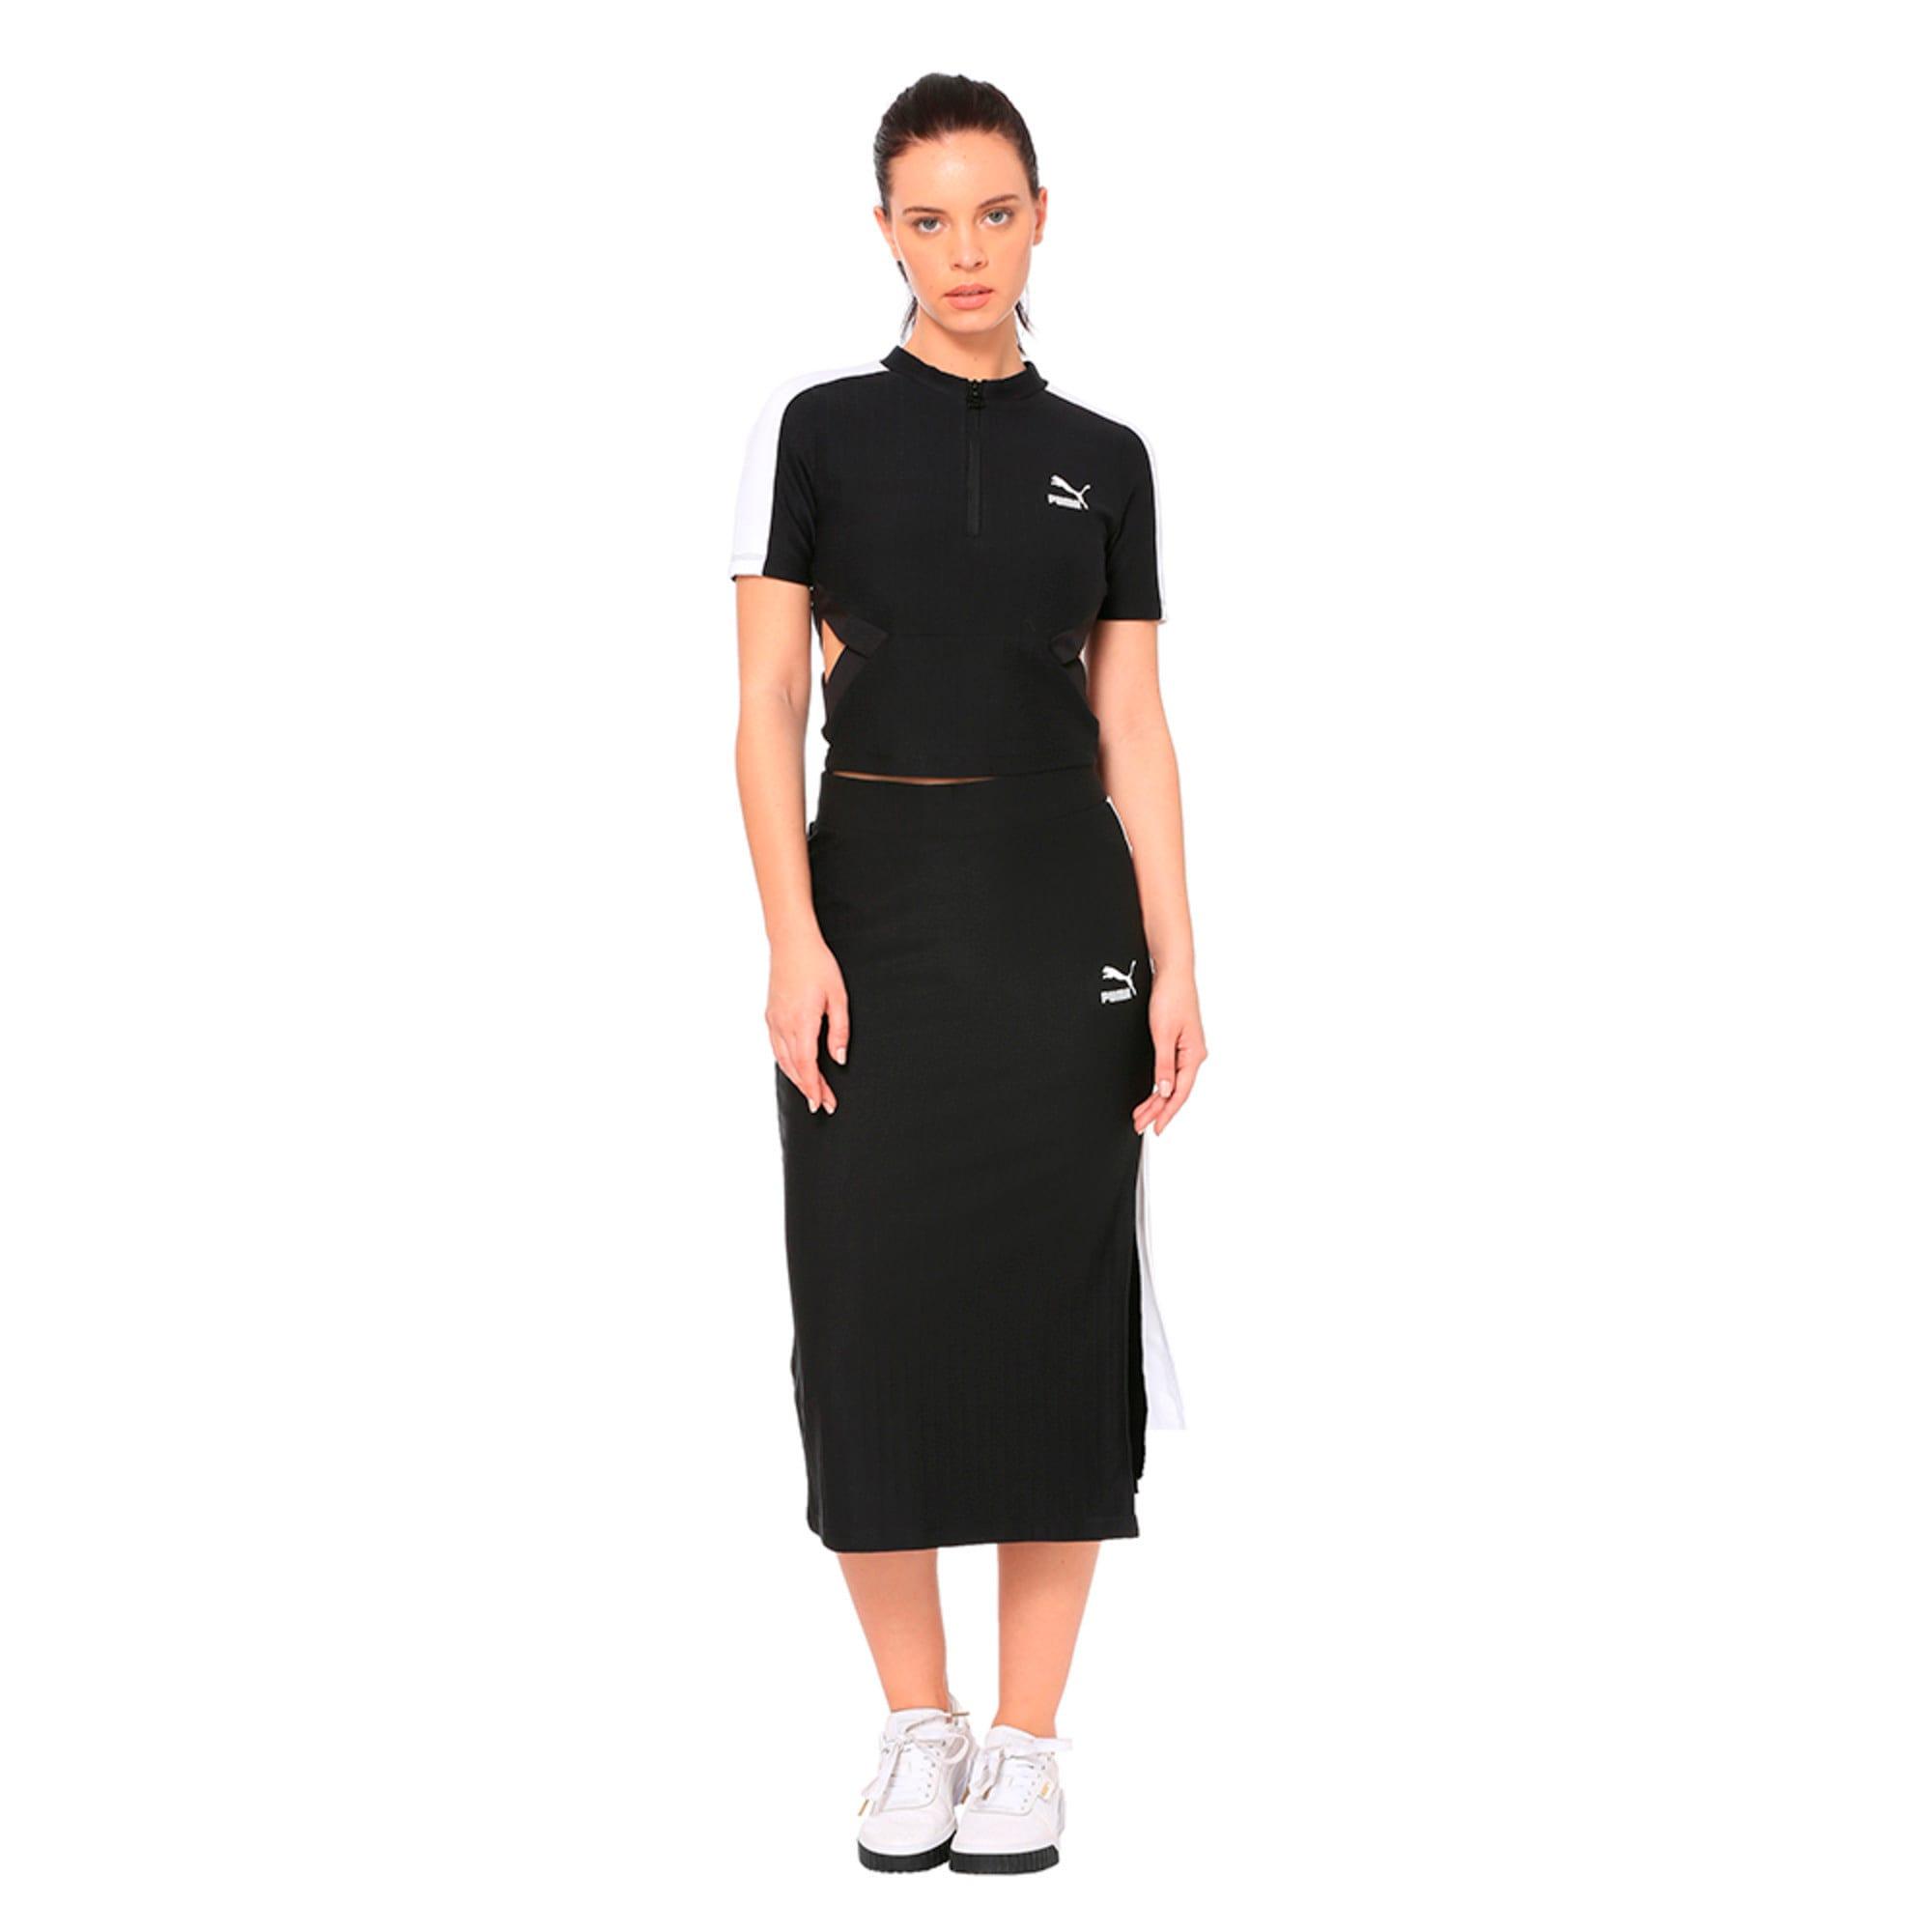 Thumbnail 3 of Classics Women's Skirt, Puma Black, medium-IND